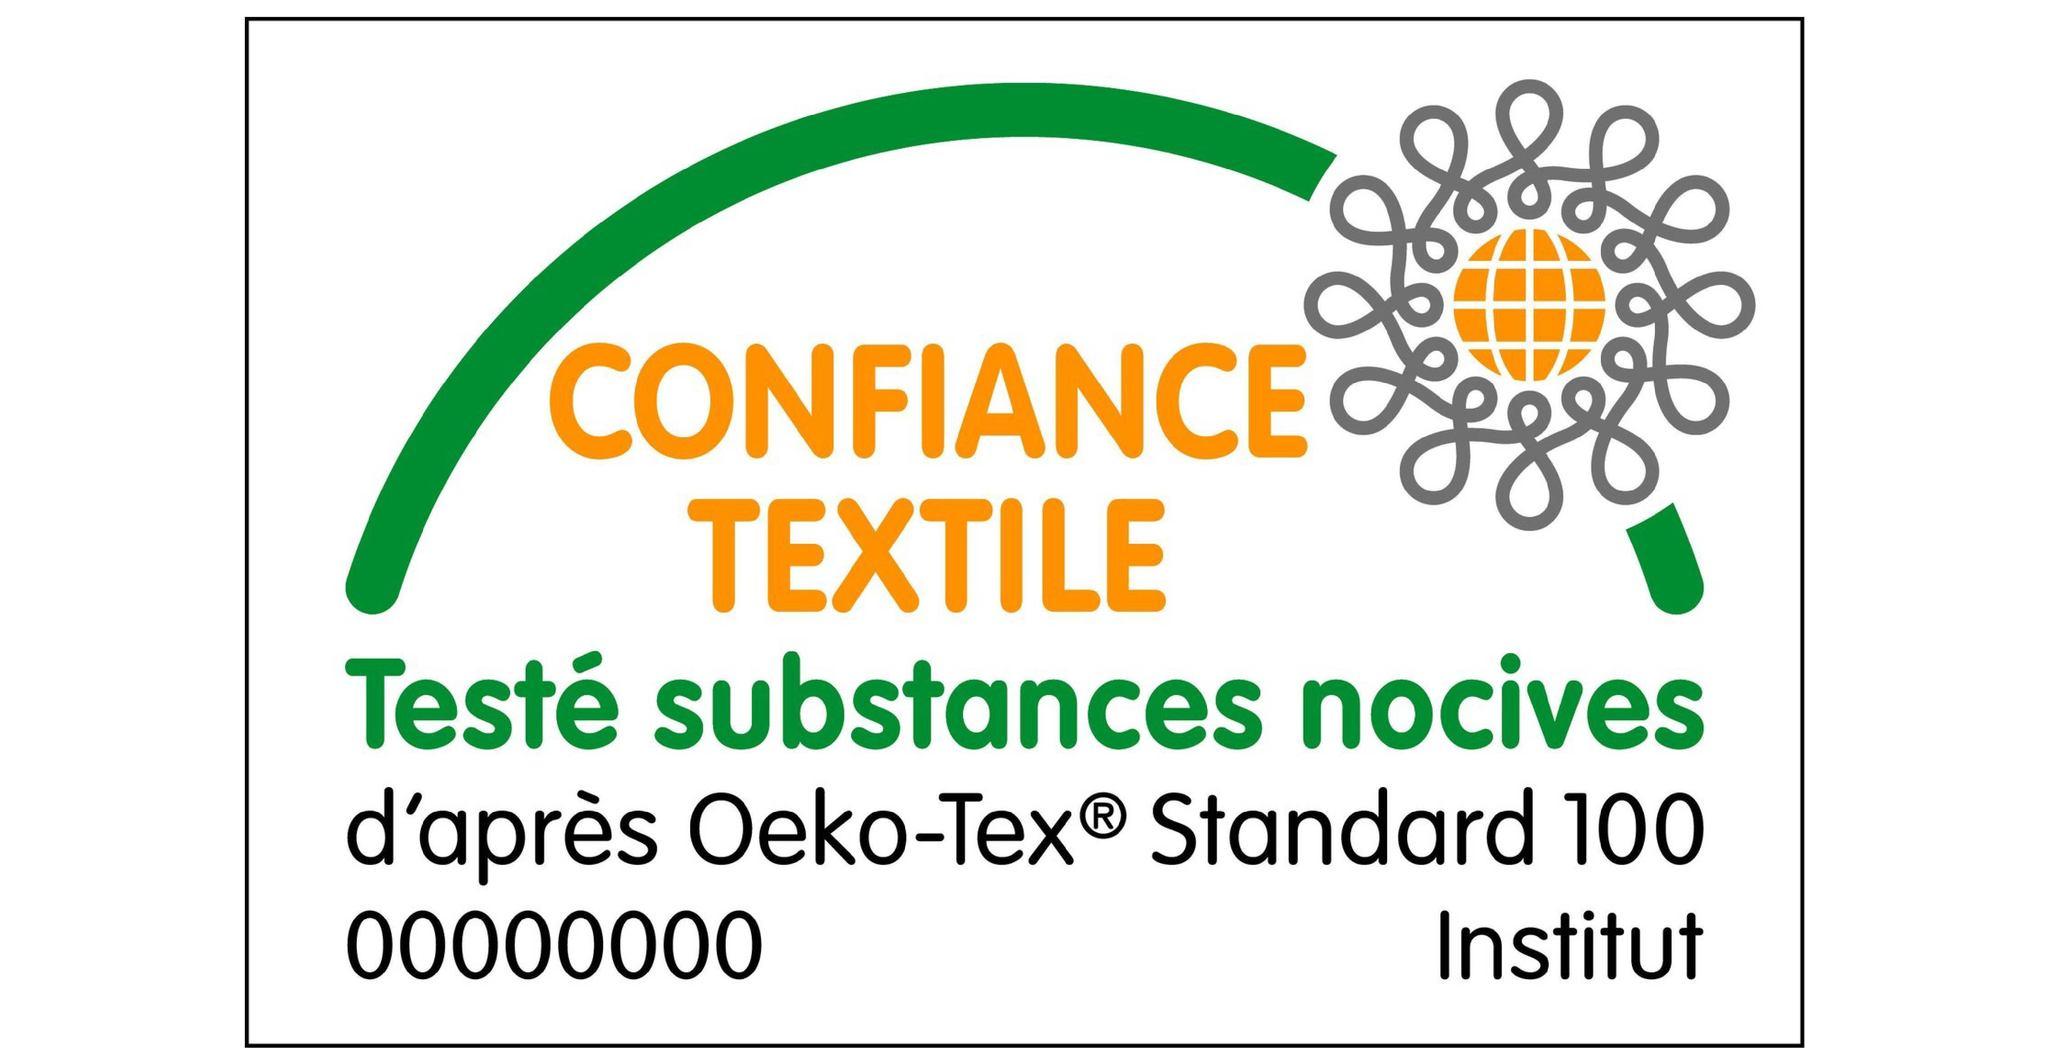 label Textile d'après Oeko-Tex standard 100